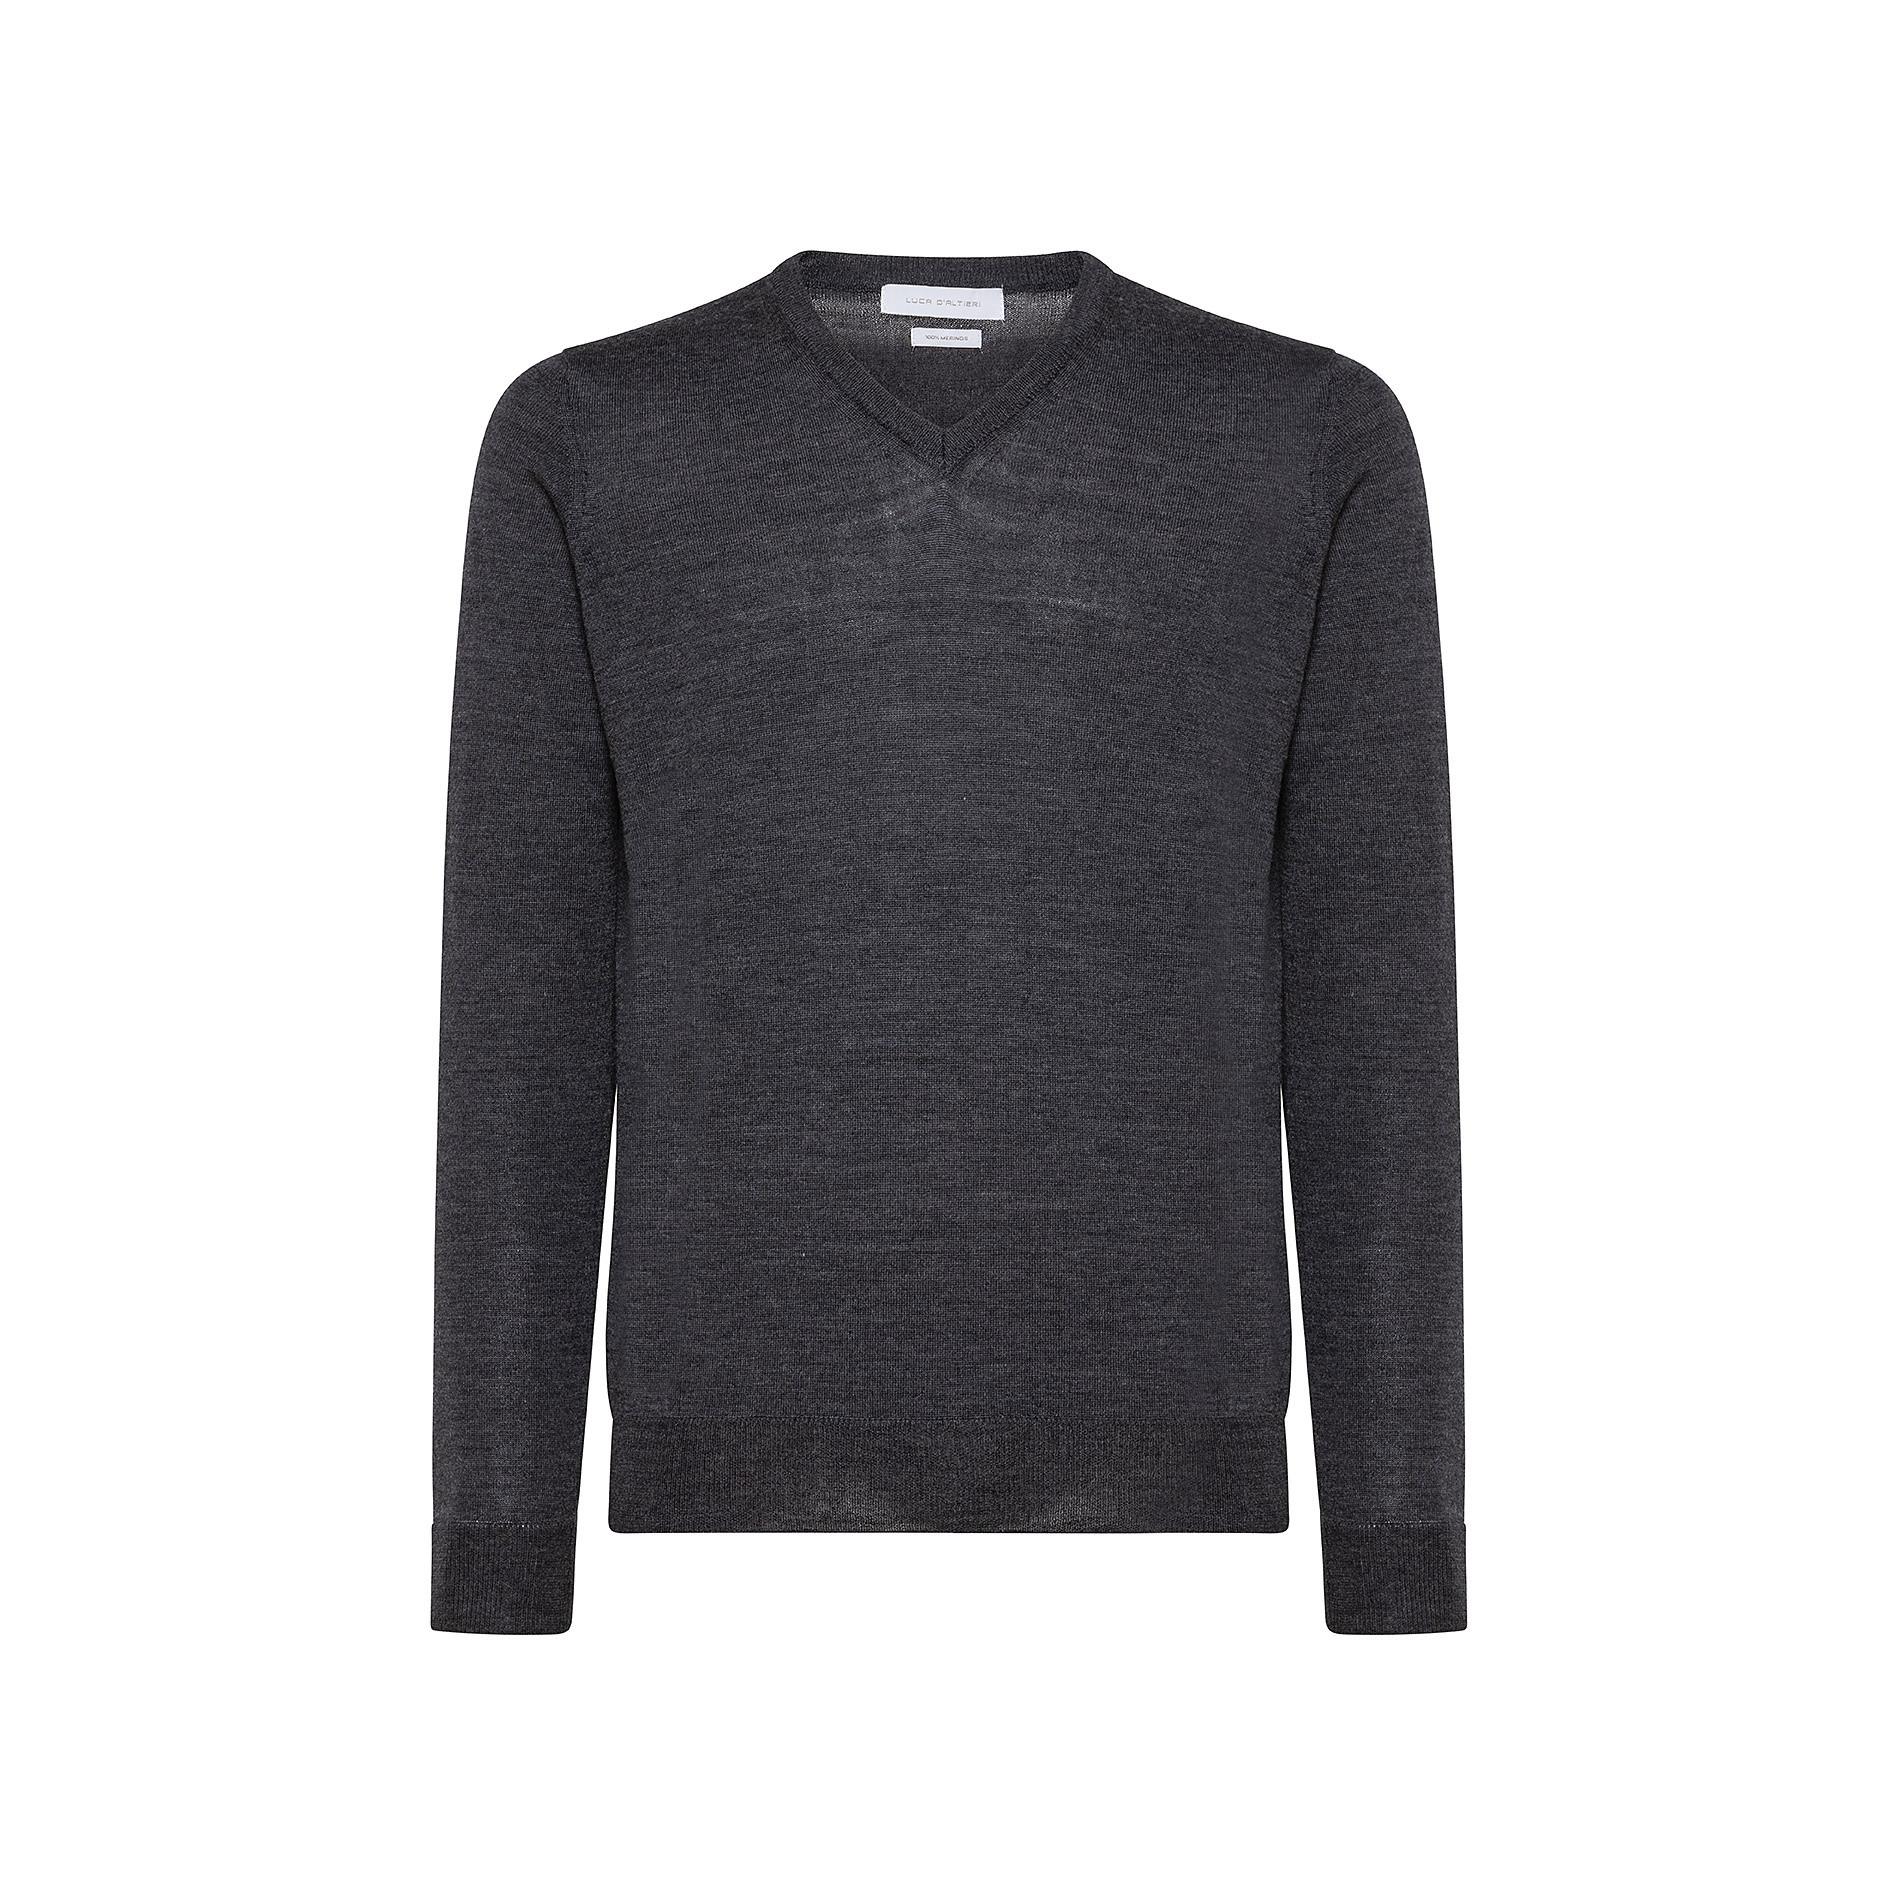 Pullover lana merinos extrafine scollo a V, Grigio chiaro, large image number 0